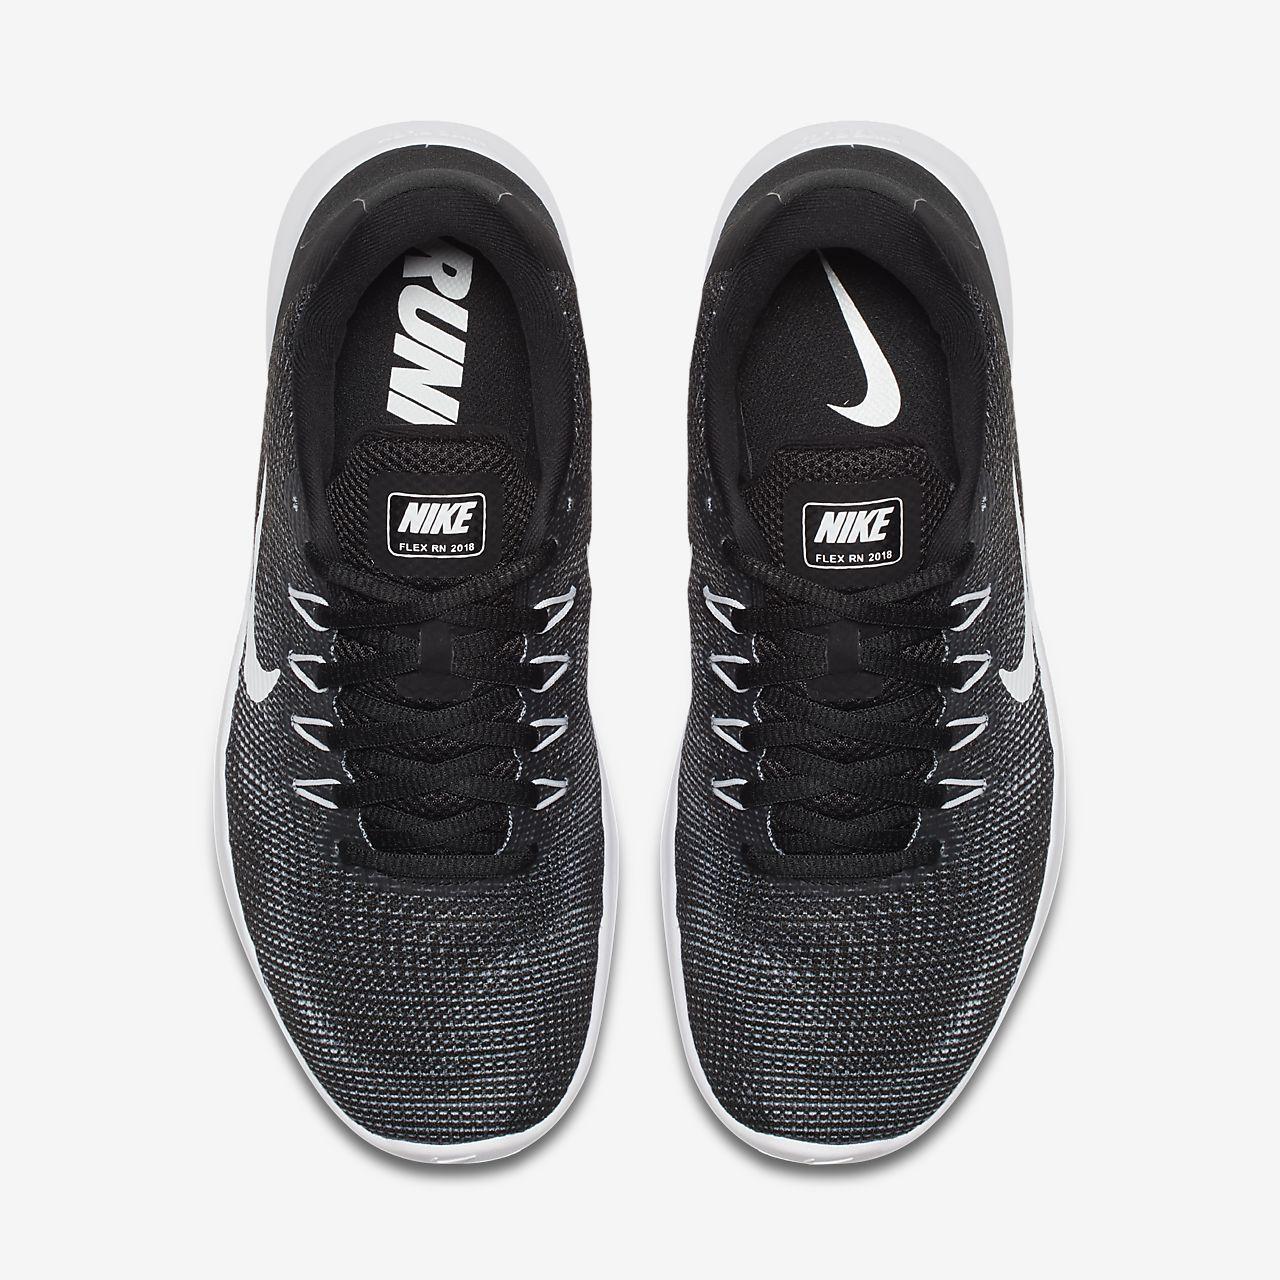 4cc47c6c68d144 Nike Flex RN 2018 Damen-Laufschuh. Nike.com DE